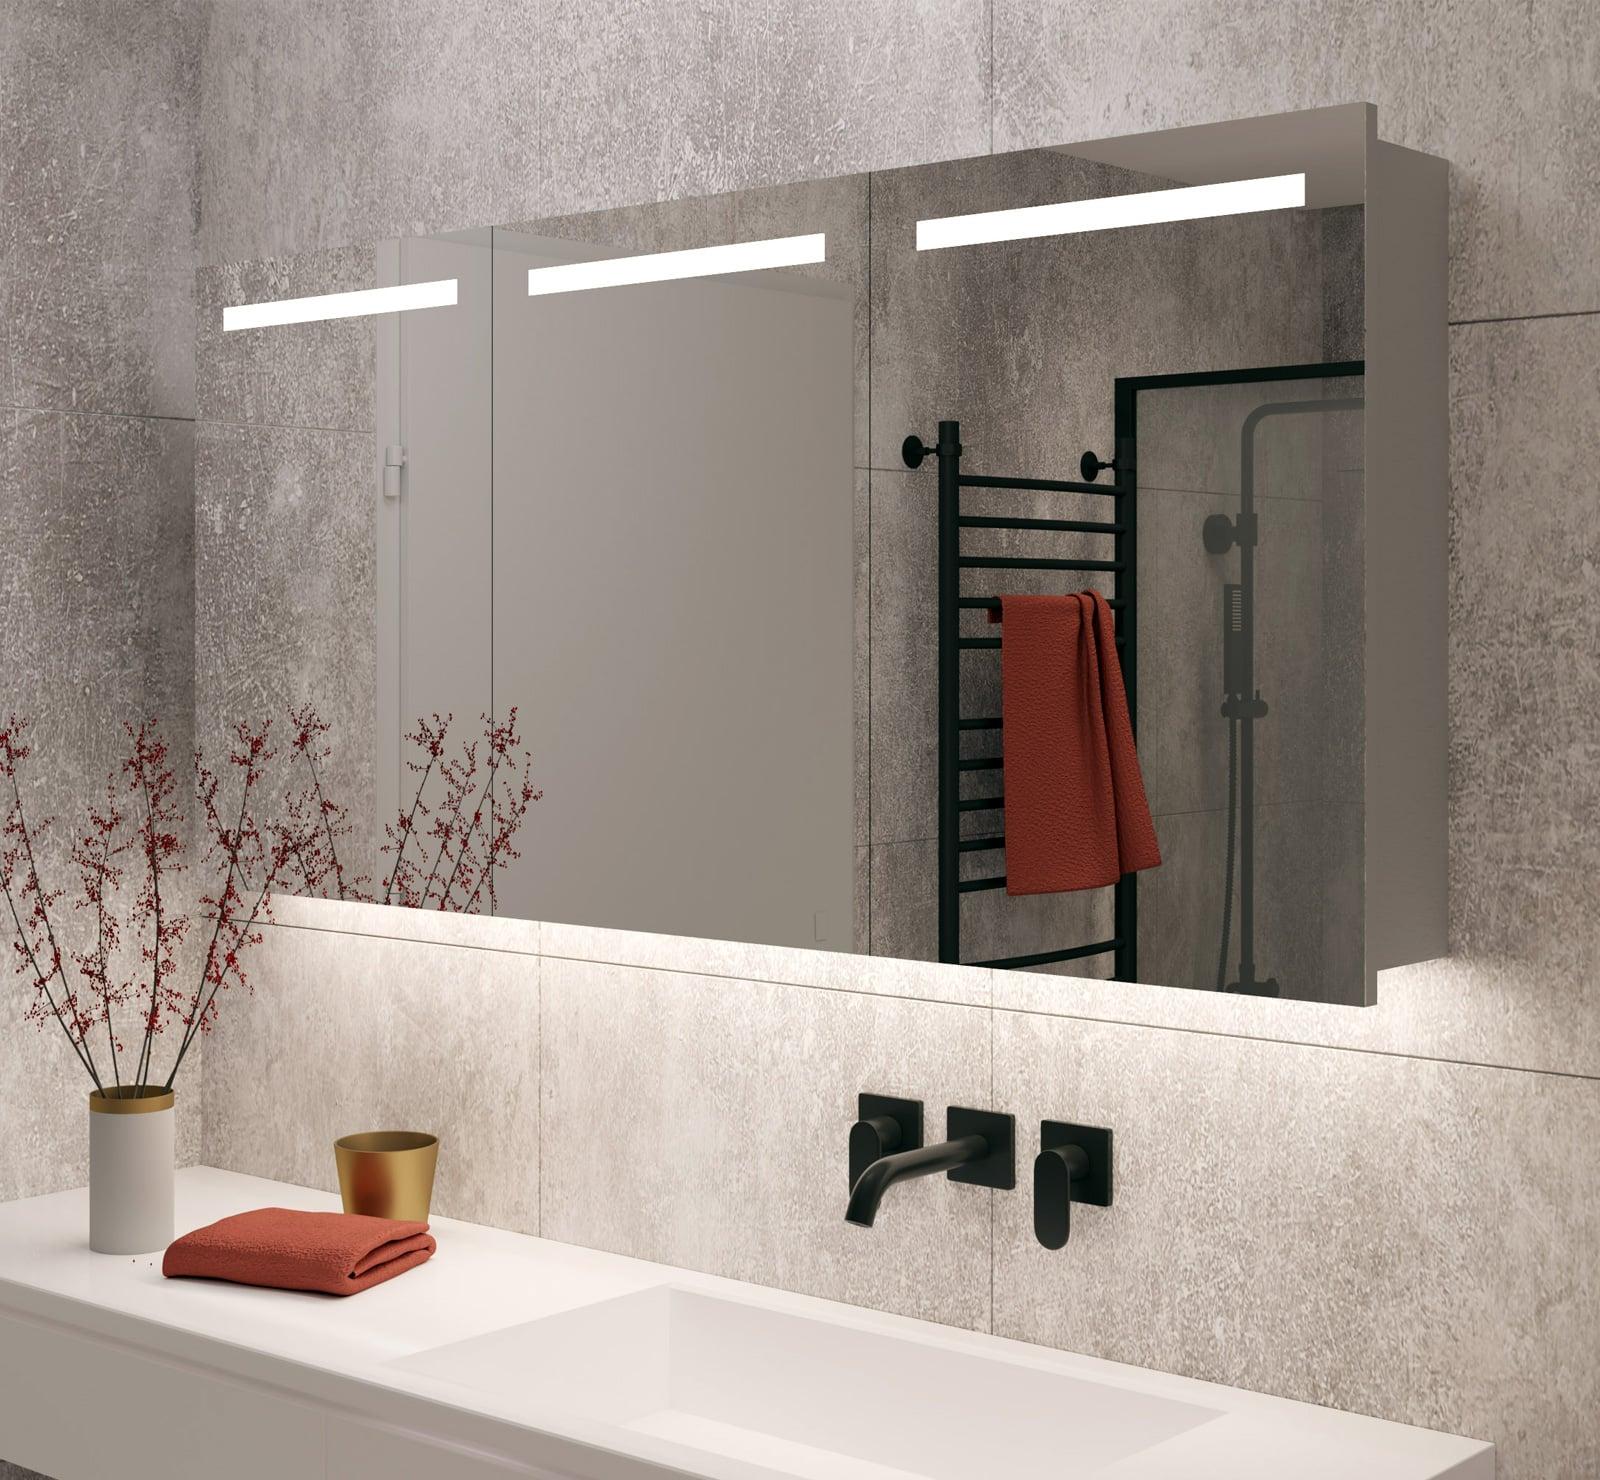 Grote badkamer spiegelkast met verlichting en verwarming